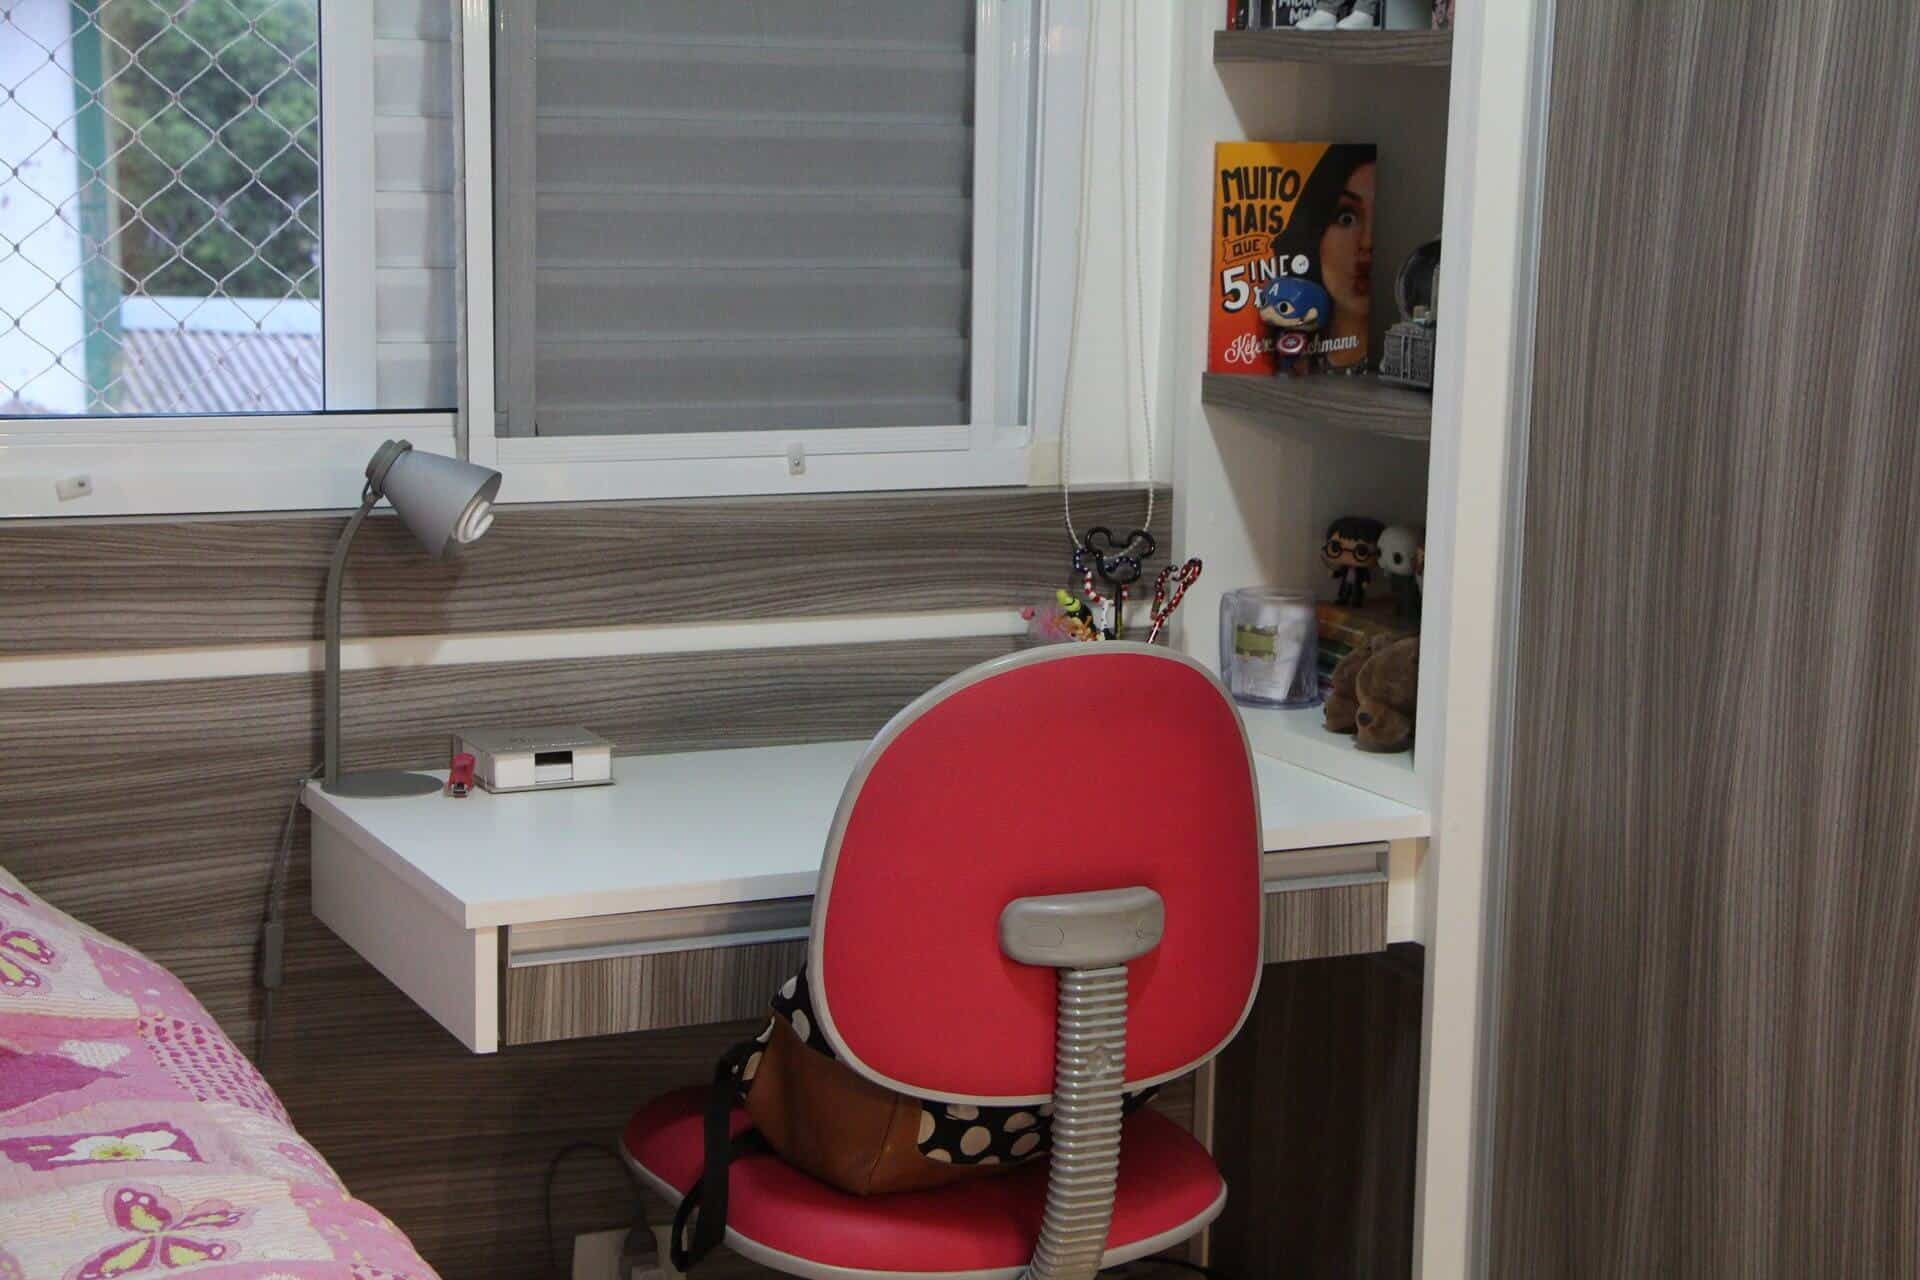 dormitorio-planejado_moveis-sob-medida-galeria-58